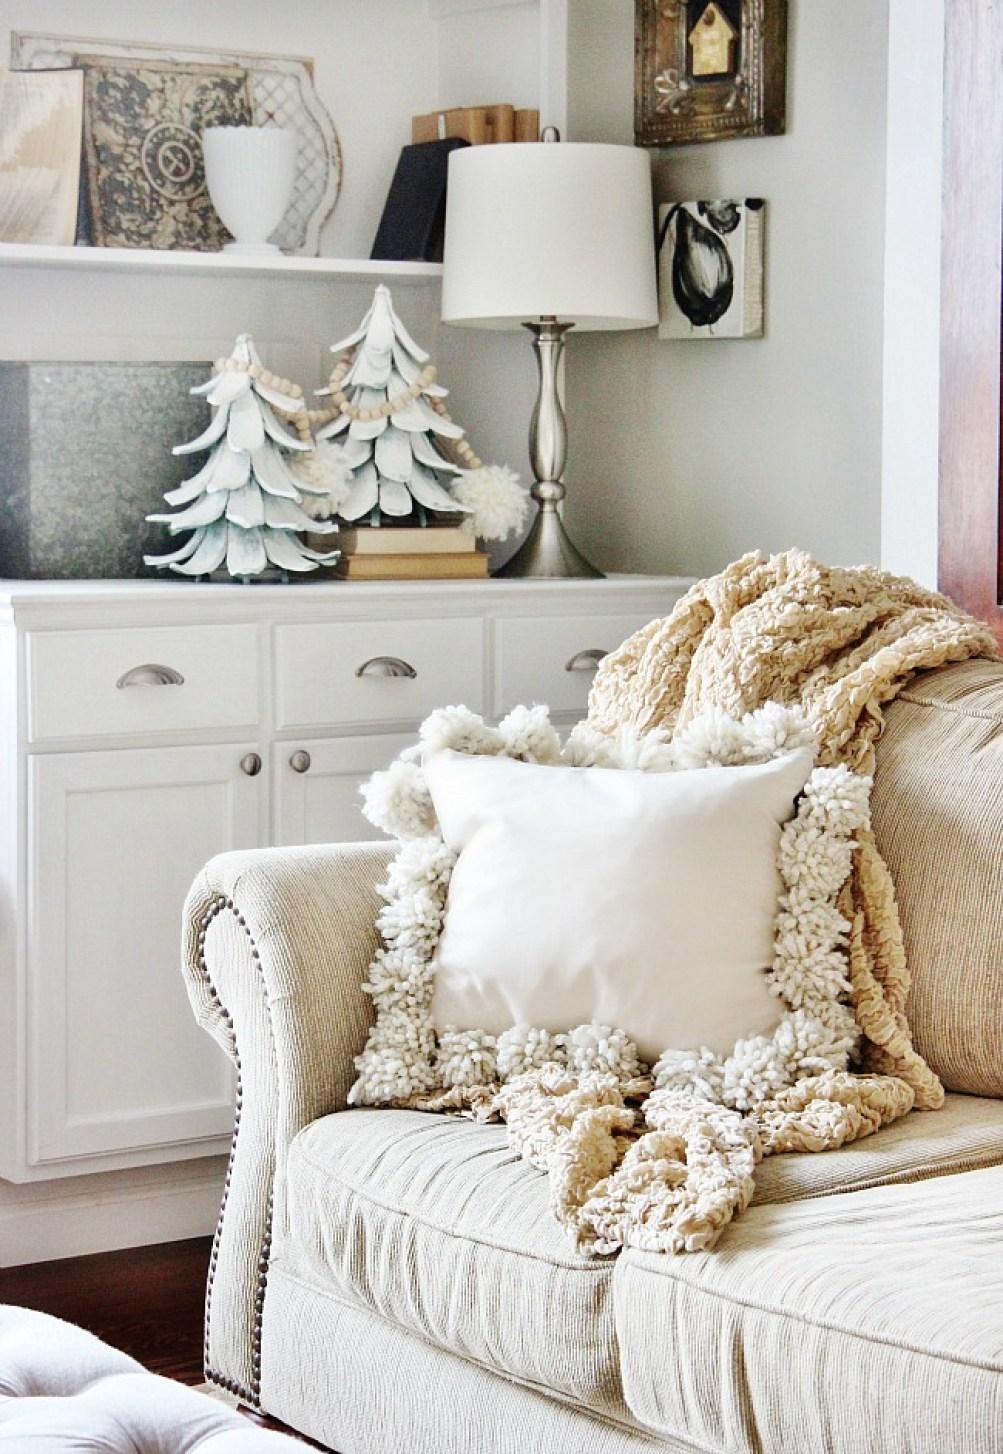 10 DIY Winter Decorations - pom pillow